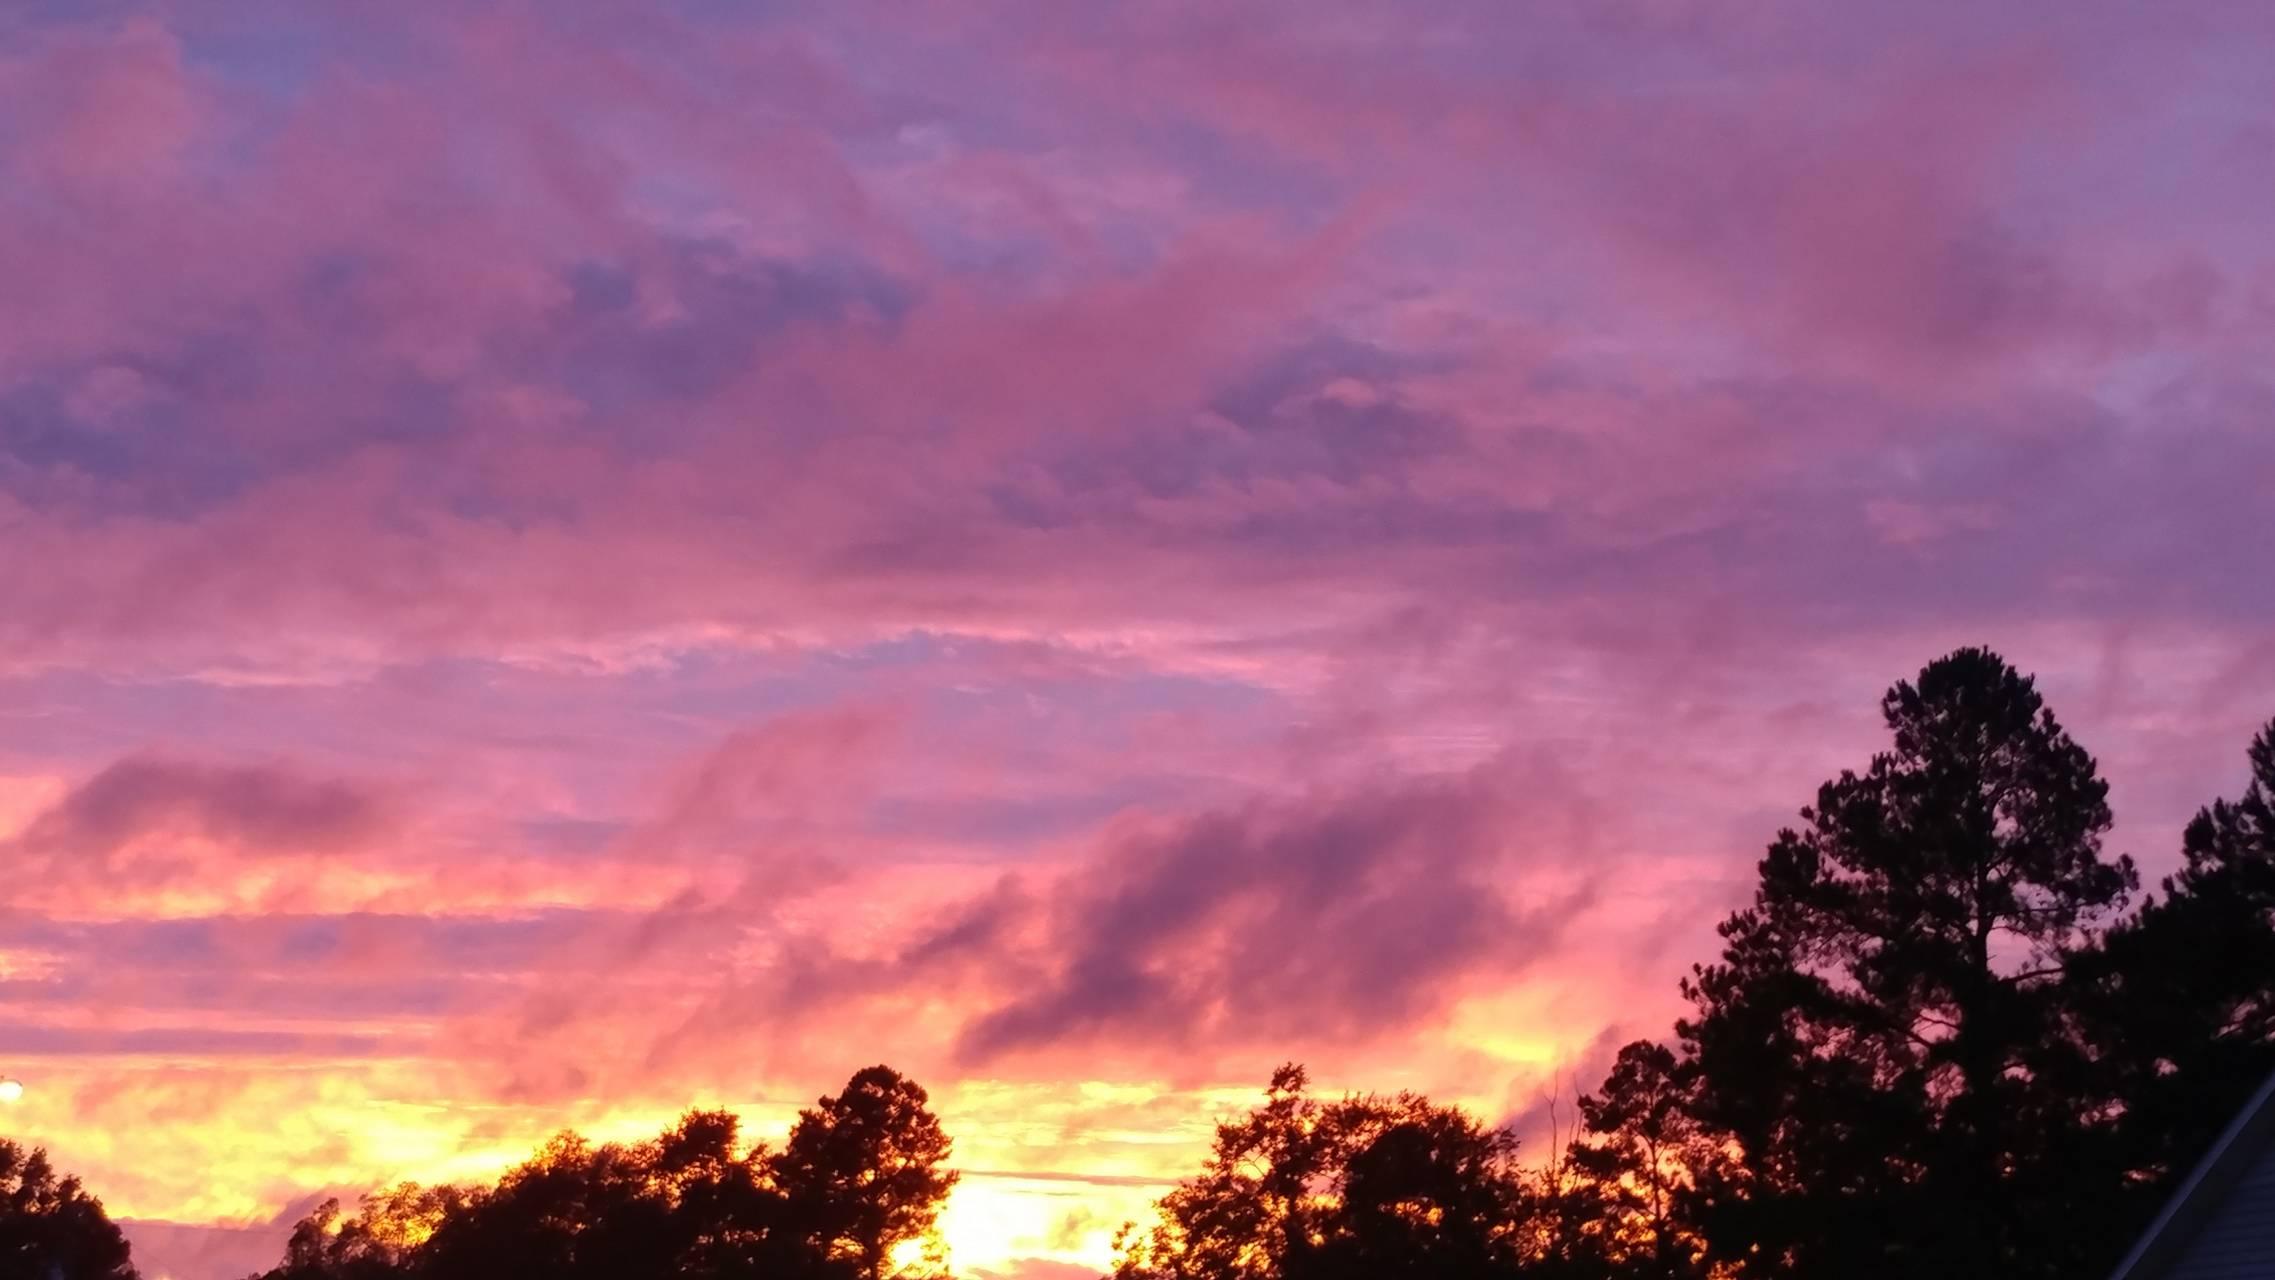 Mauve sunset